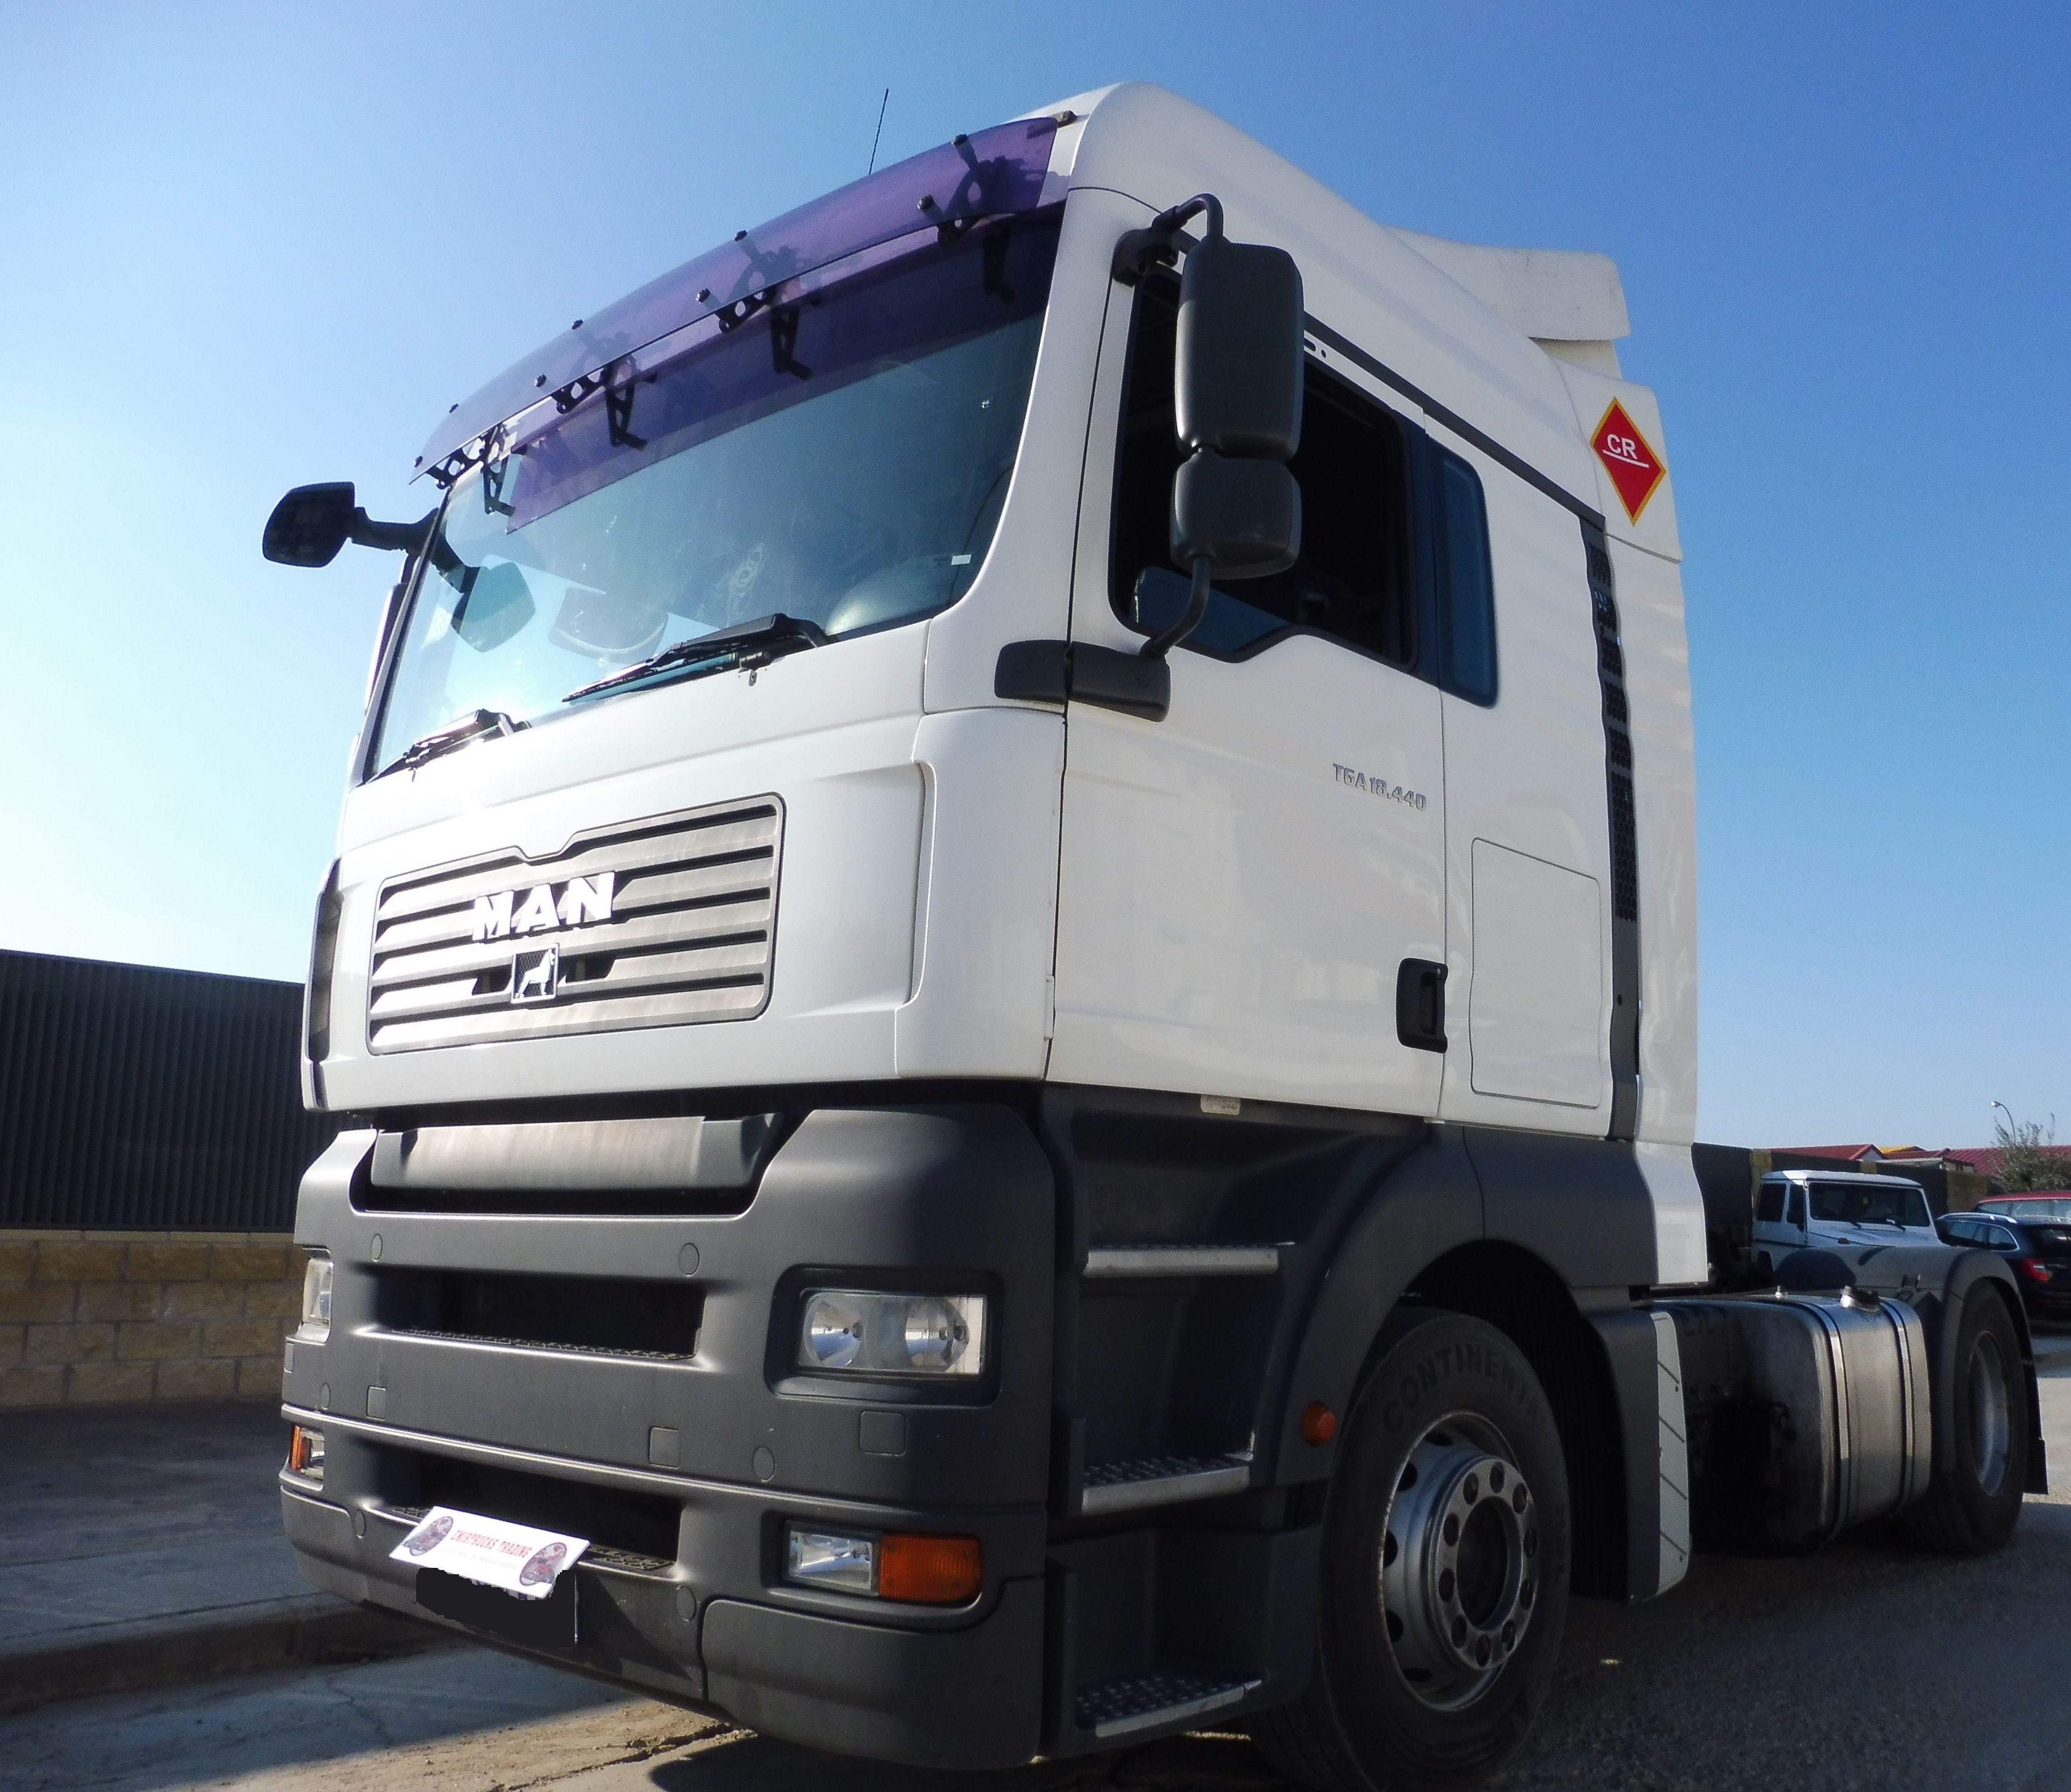 MAN TGA 18.440: Vehículos industriales de Emirtrucks Trading